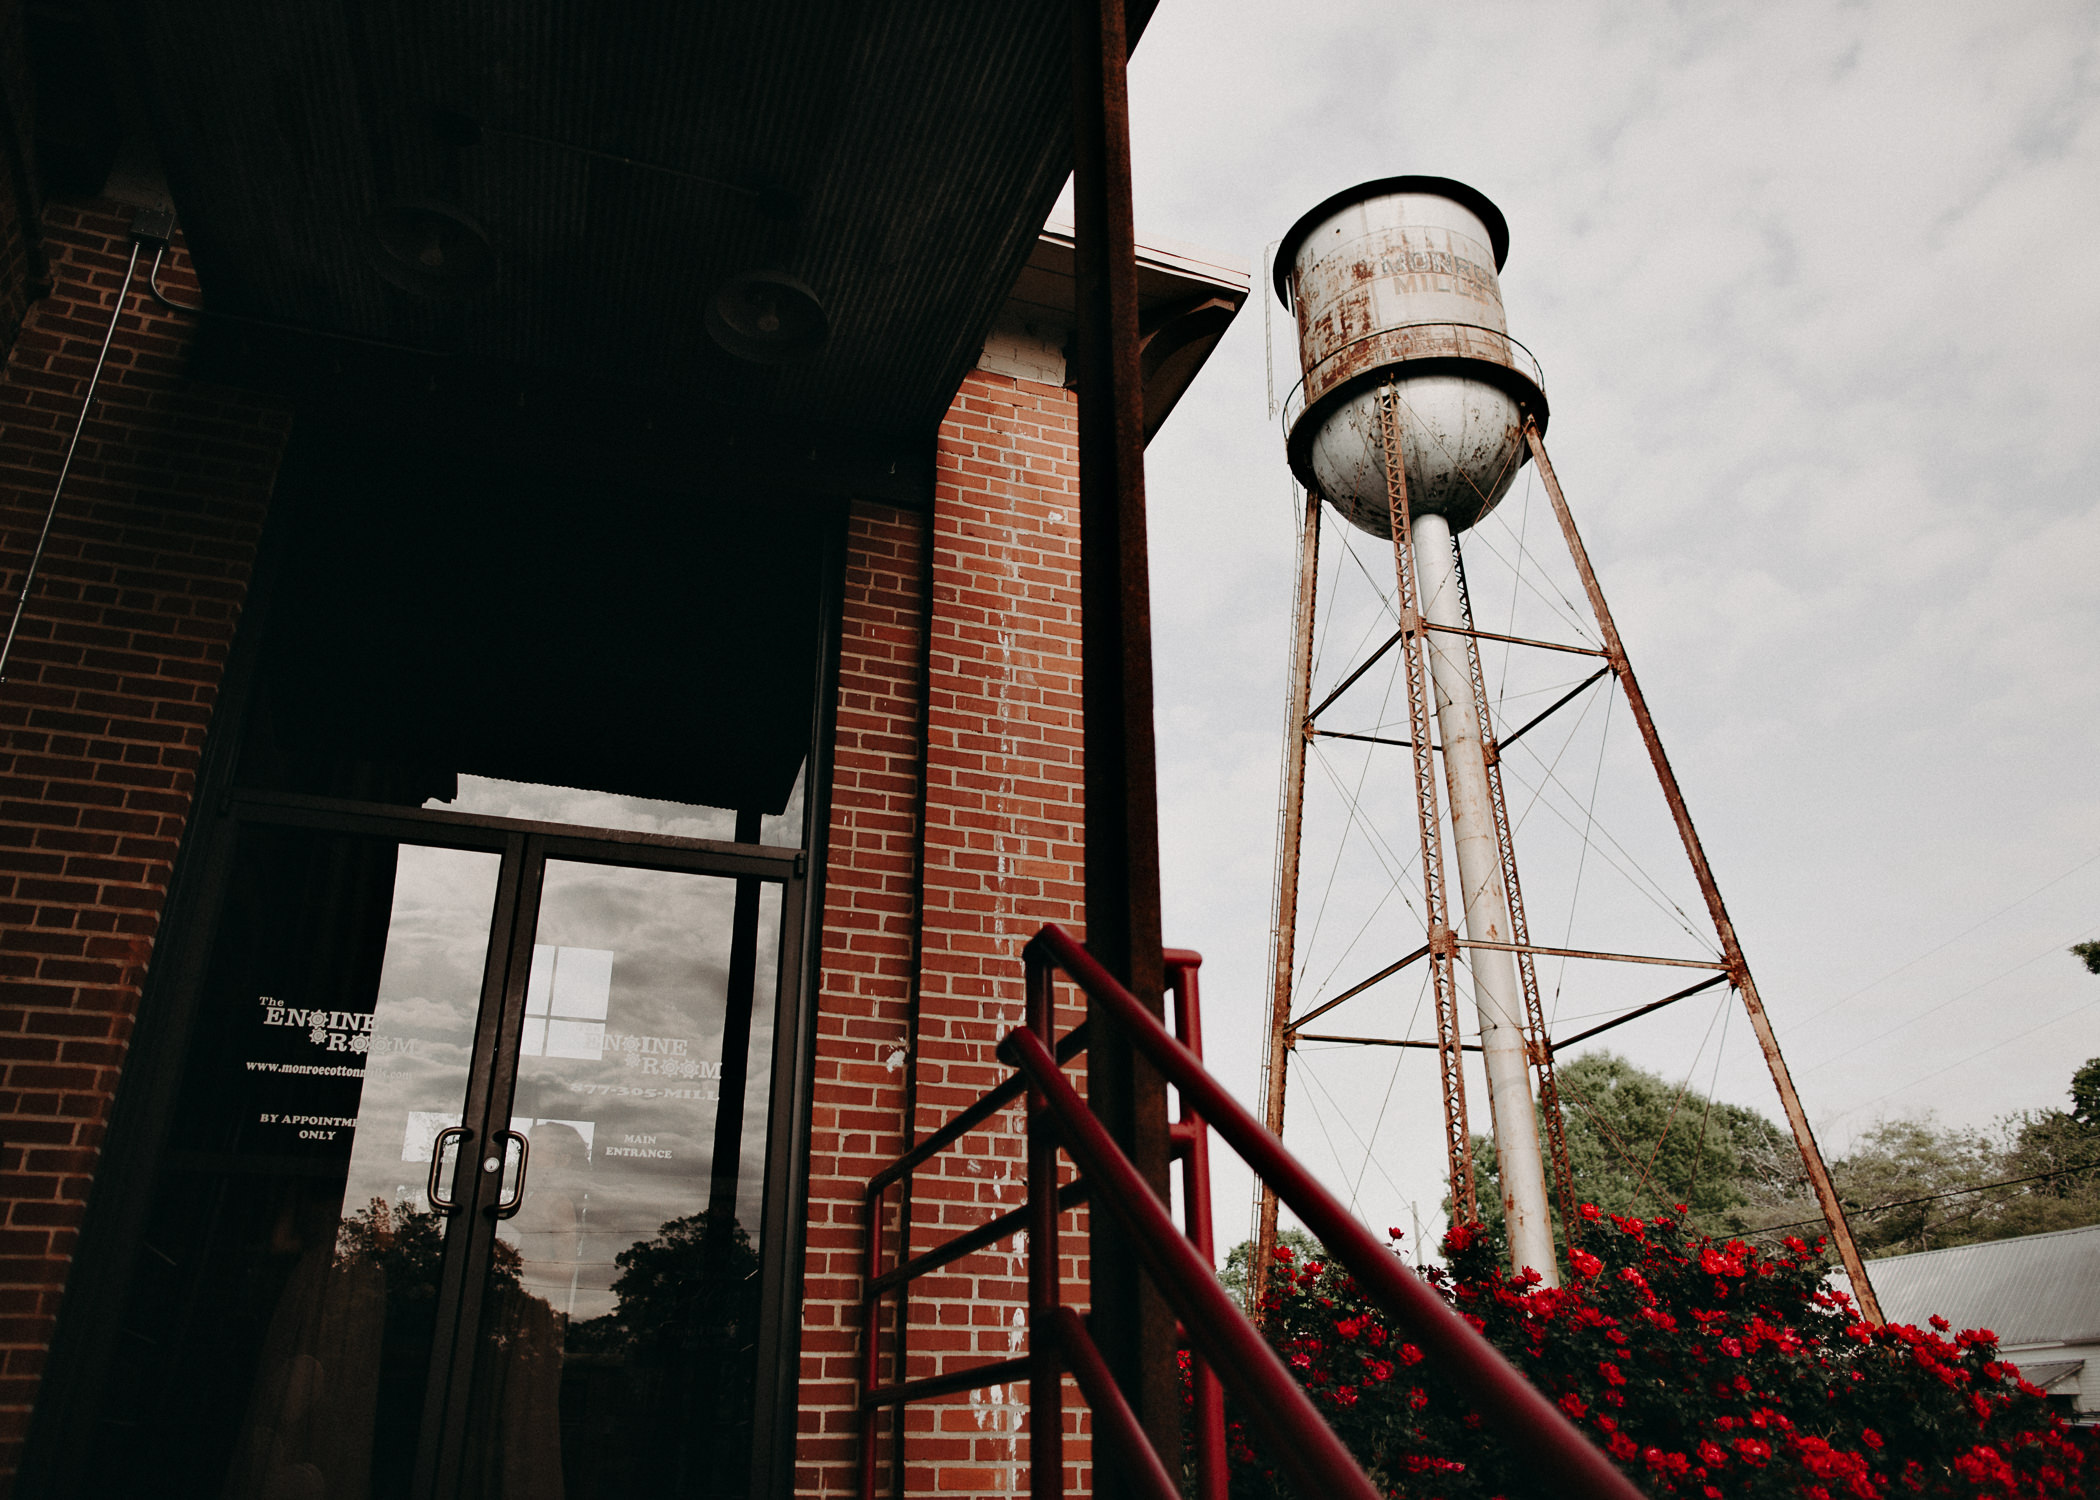 36 4 - Atlanta Wedding Photographer - The engine room - Ga - Wedding trends - Aline Marin Photography.jpg